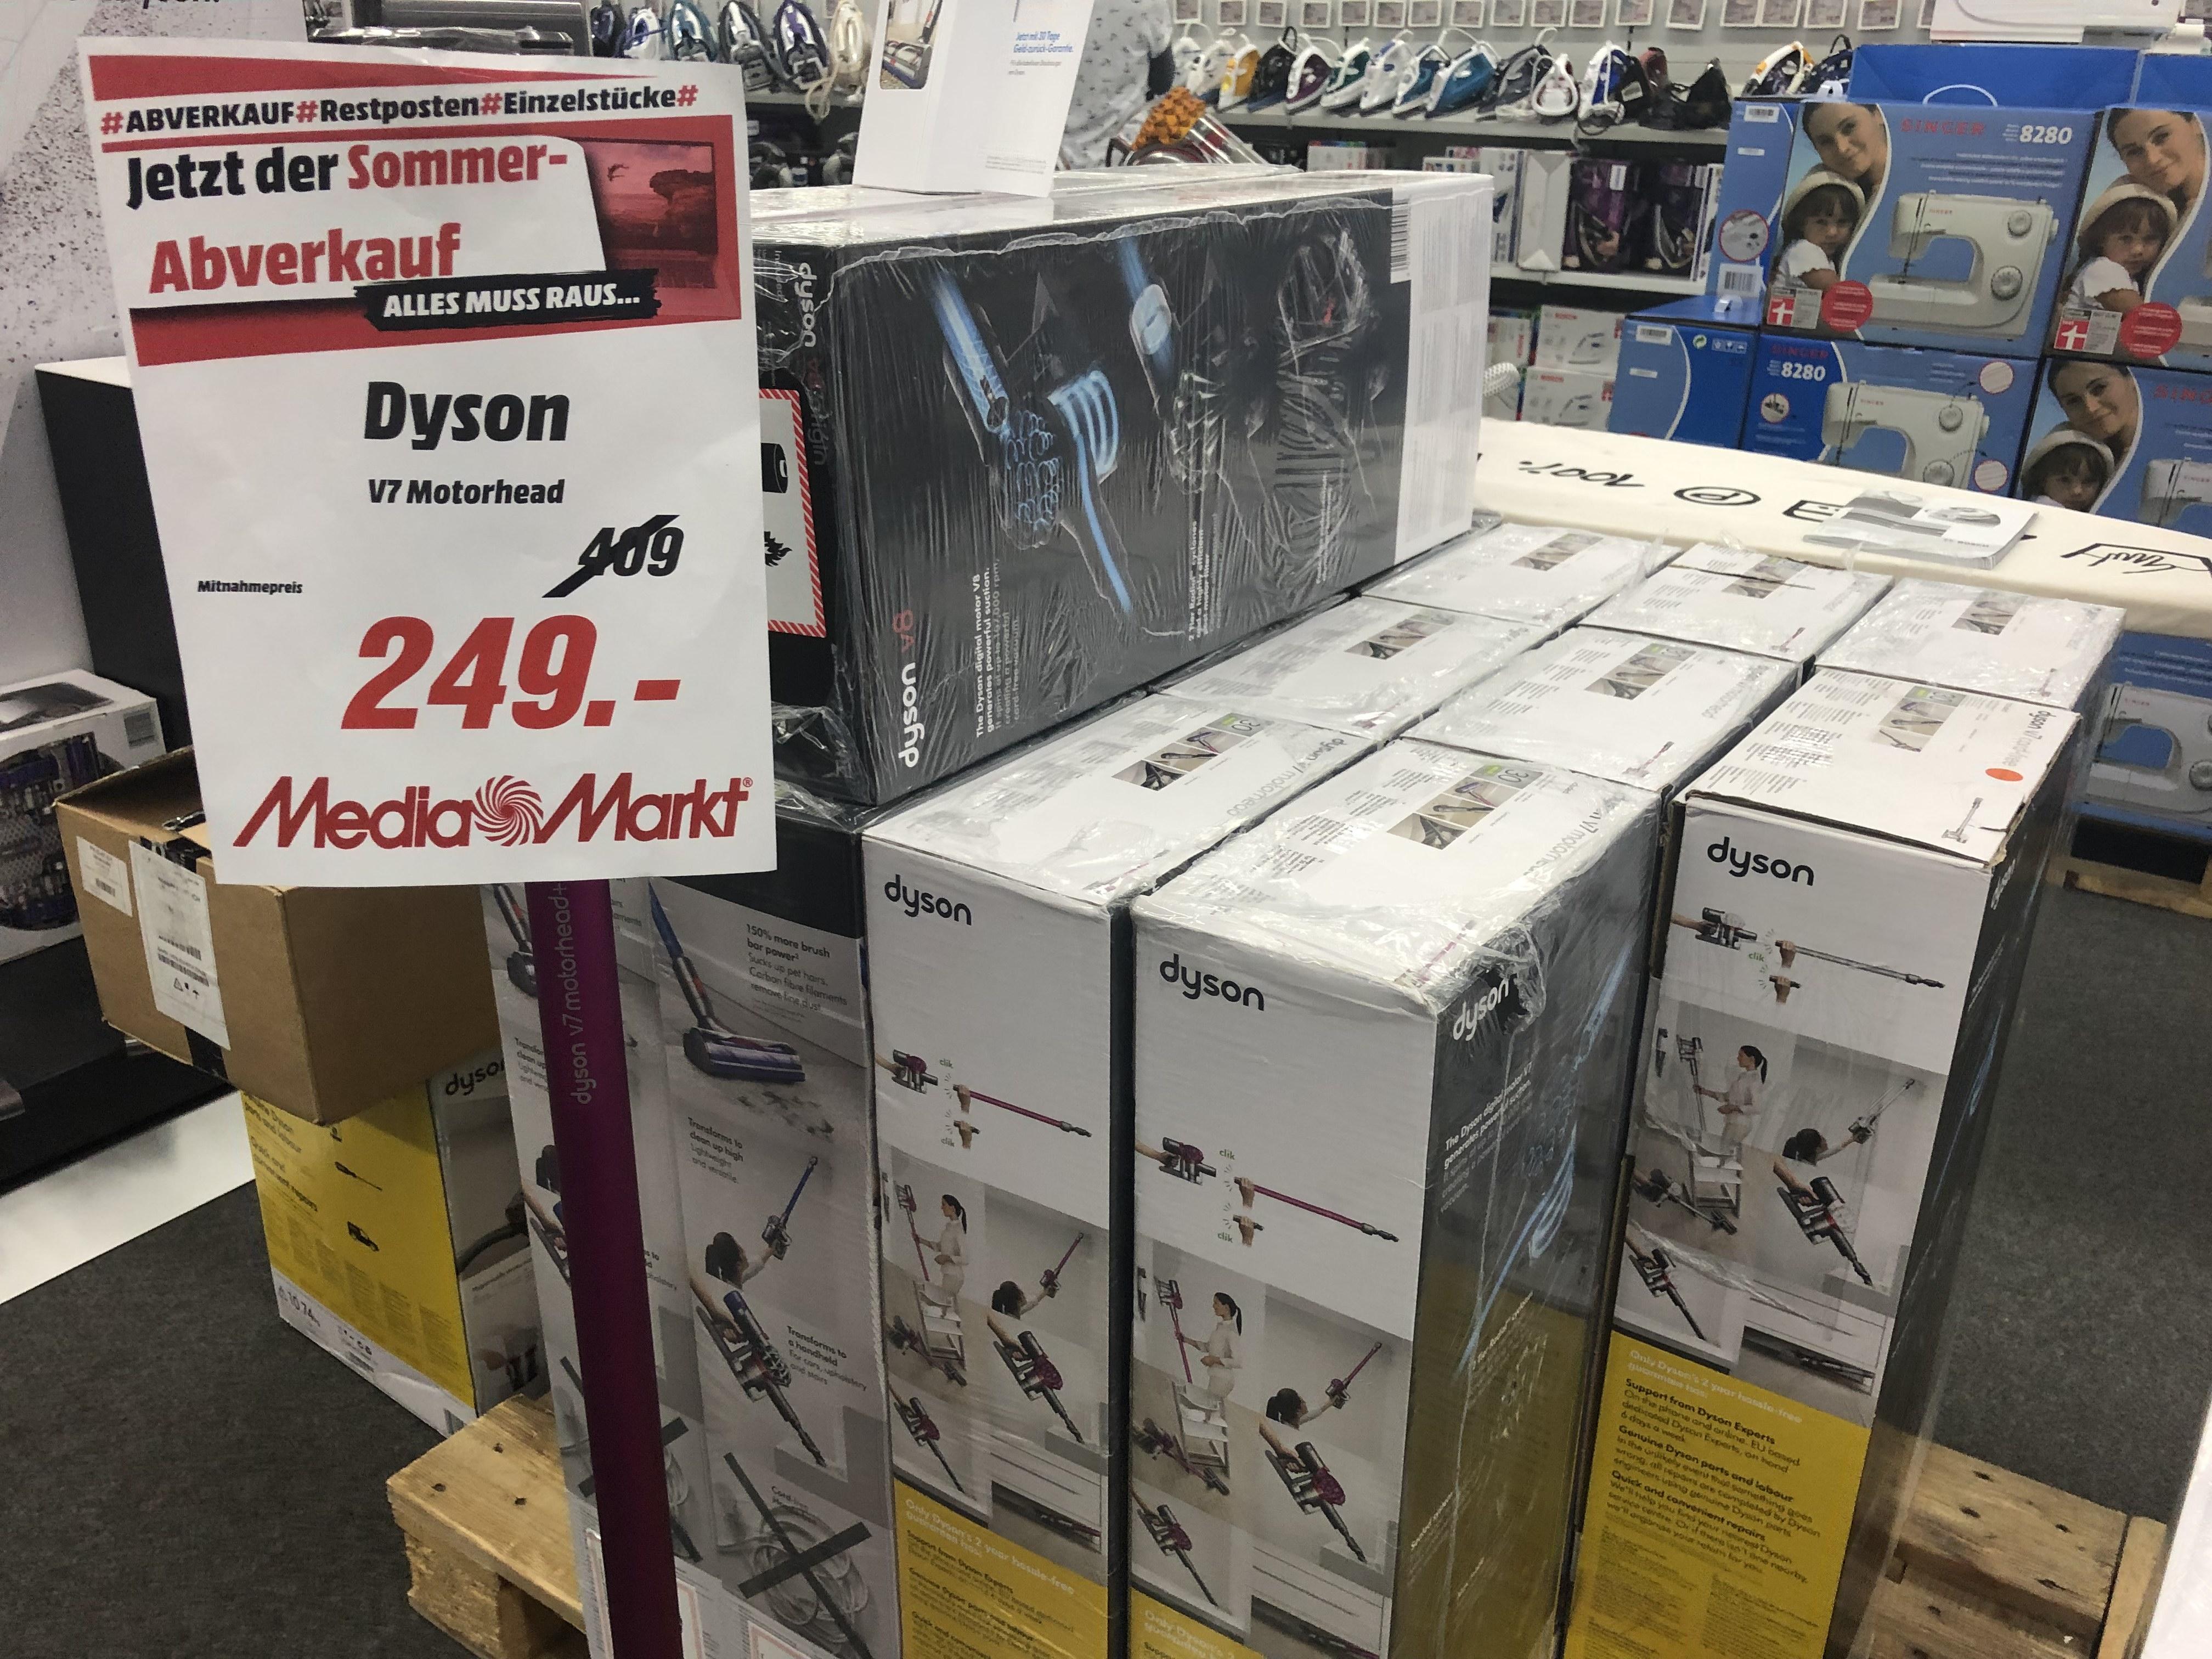 Dyson V7 Motorhead (MM Weiterstadt )